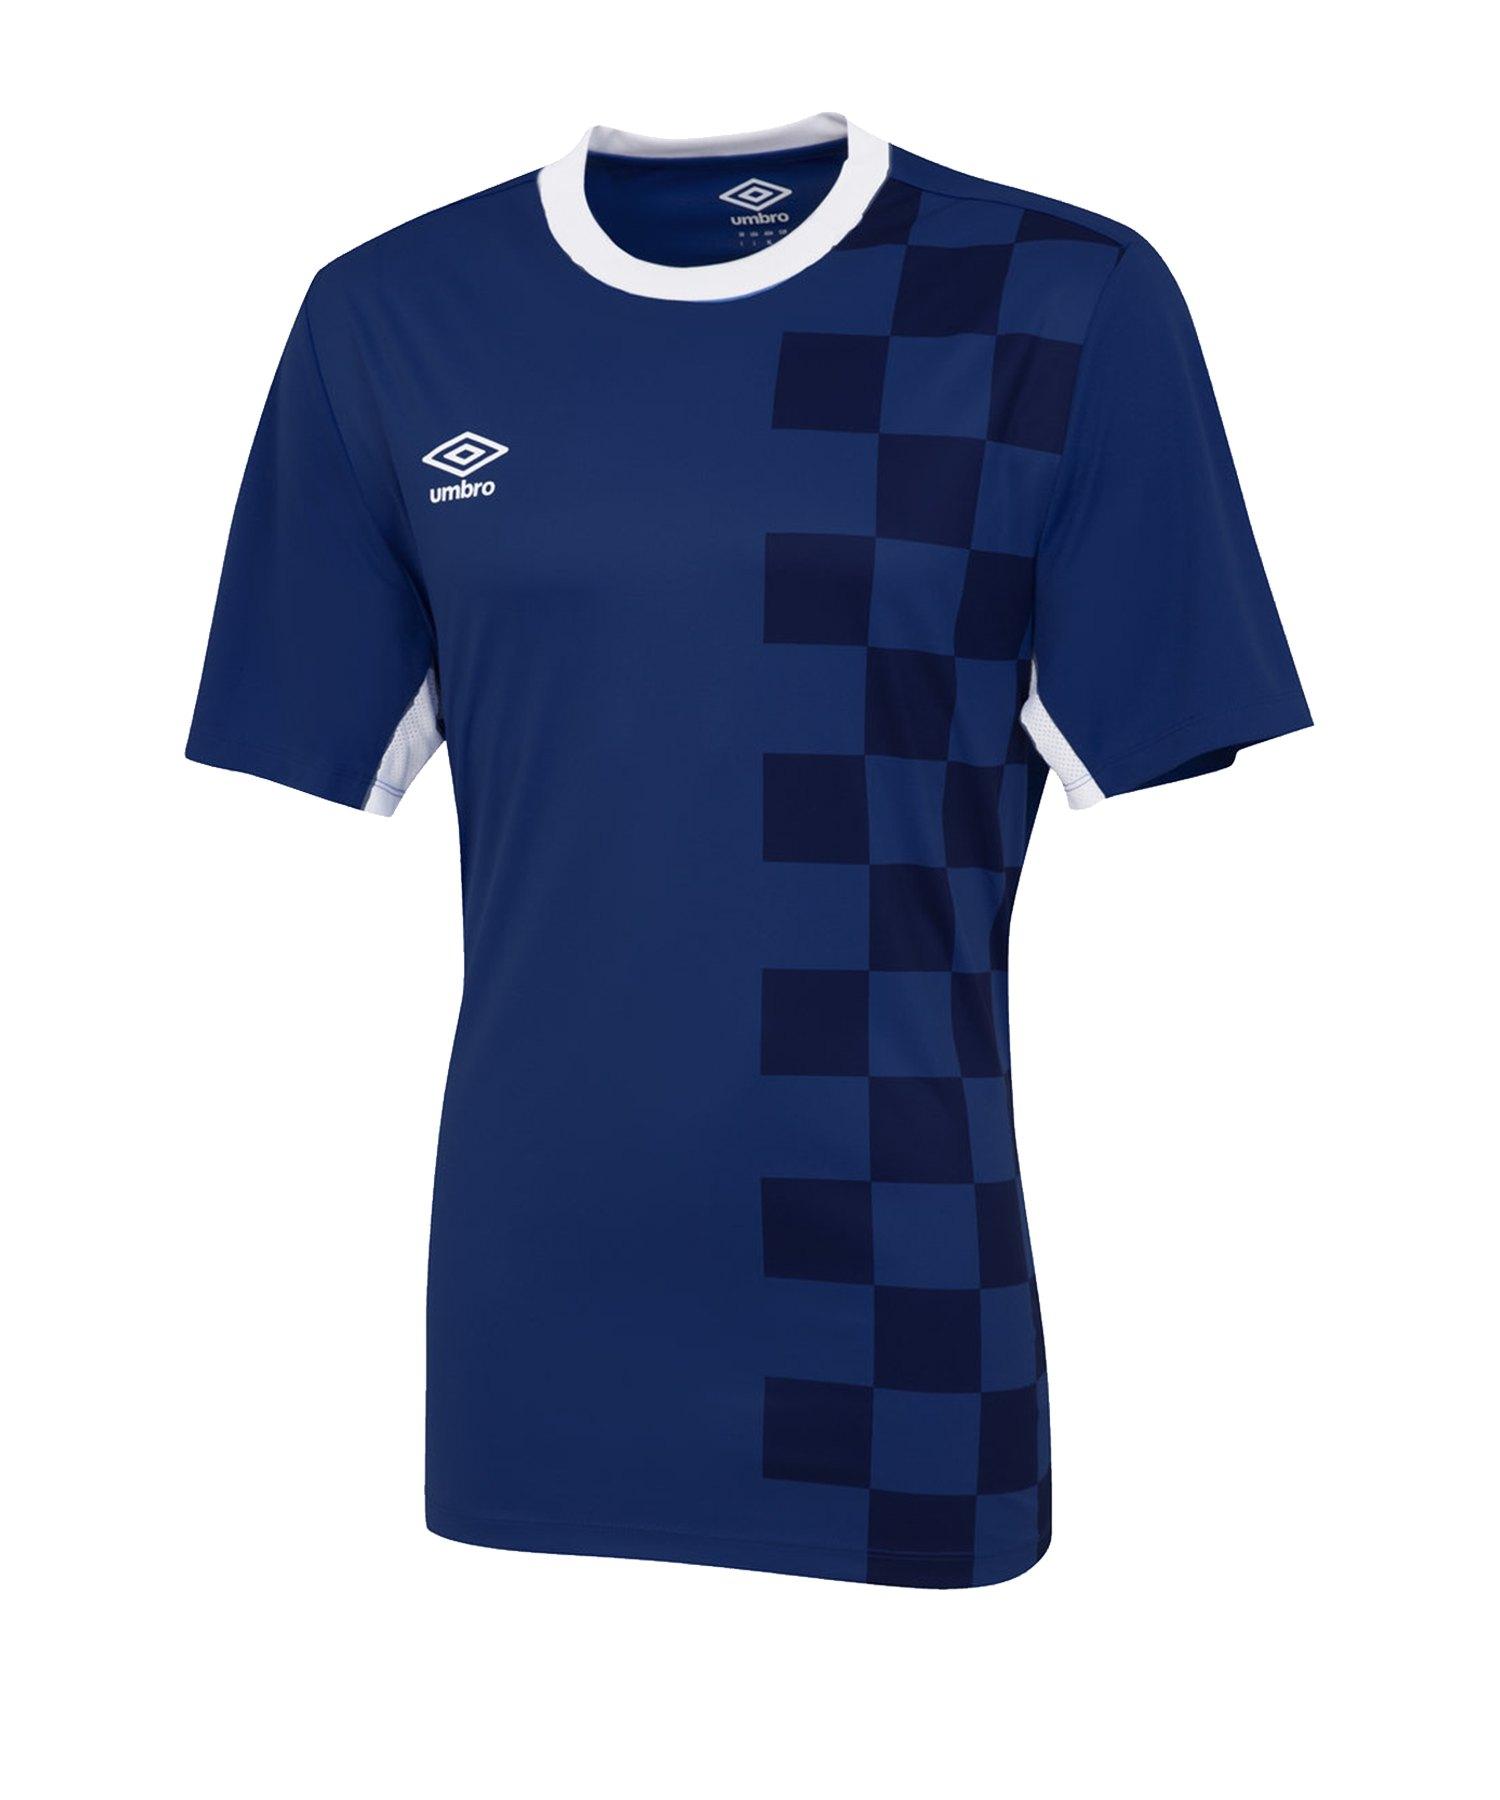 Umbro Stadion T-Shirt Blau ES6 - Blau